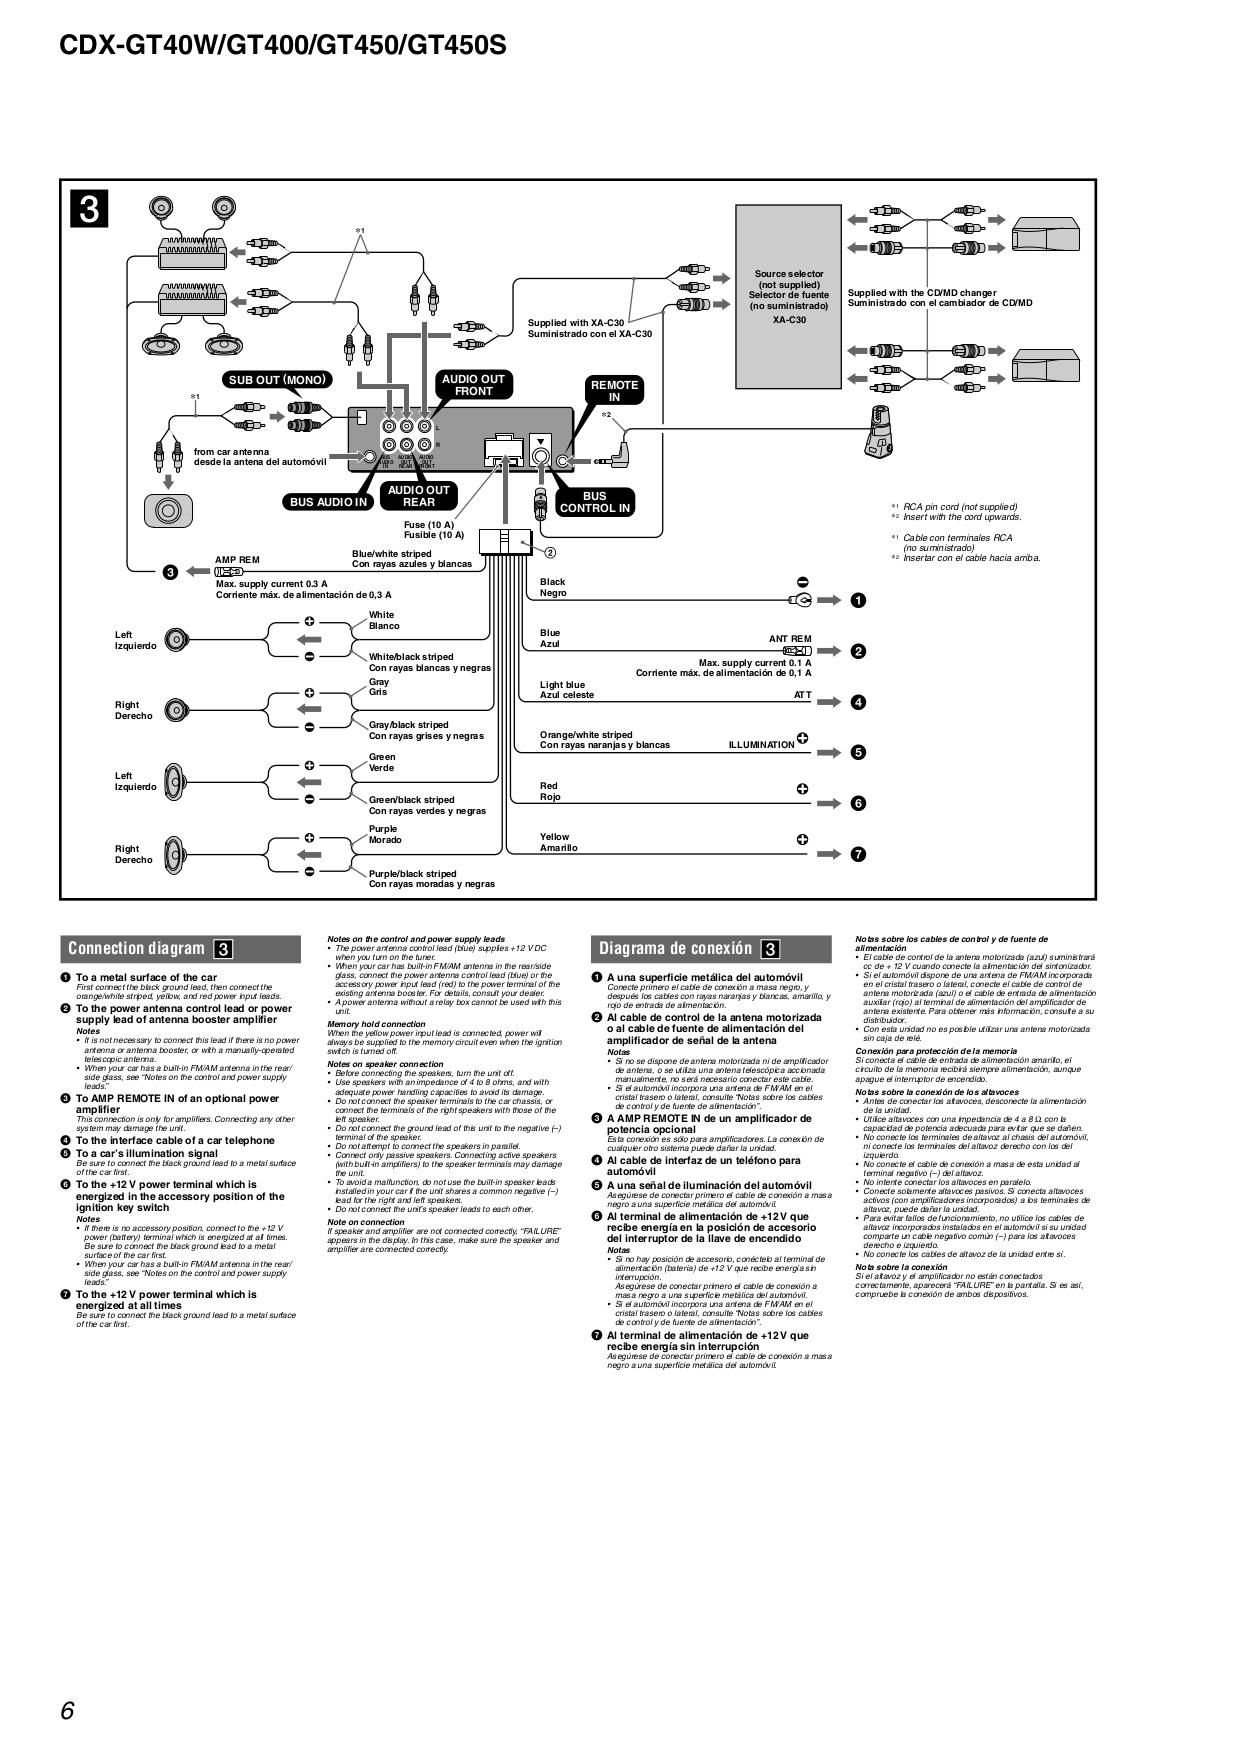 Sony Cdx Gt55uiw Wiring Diagram